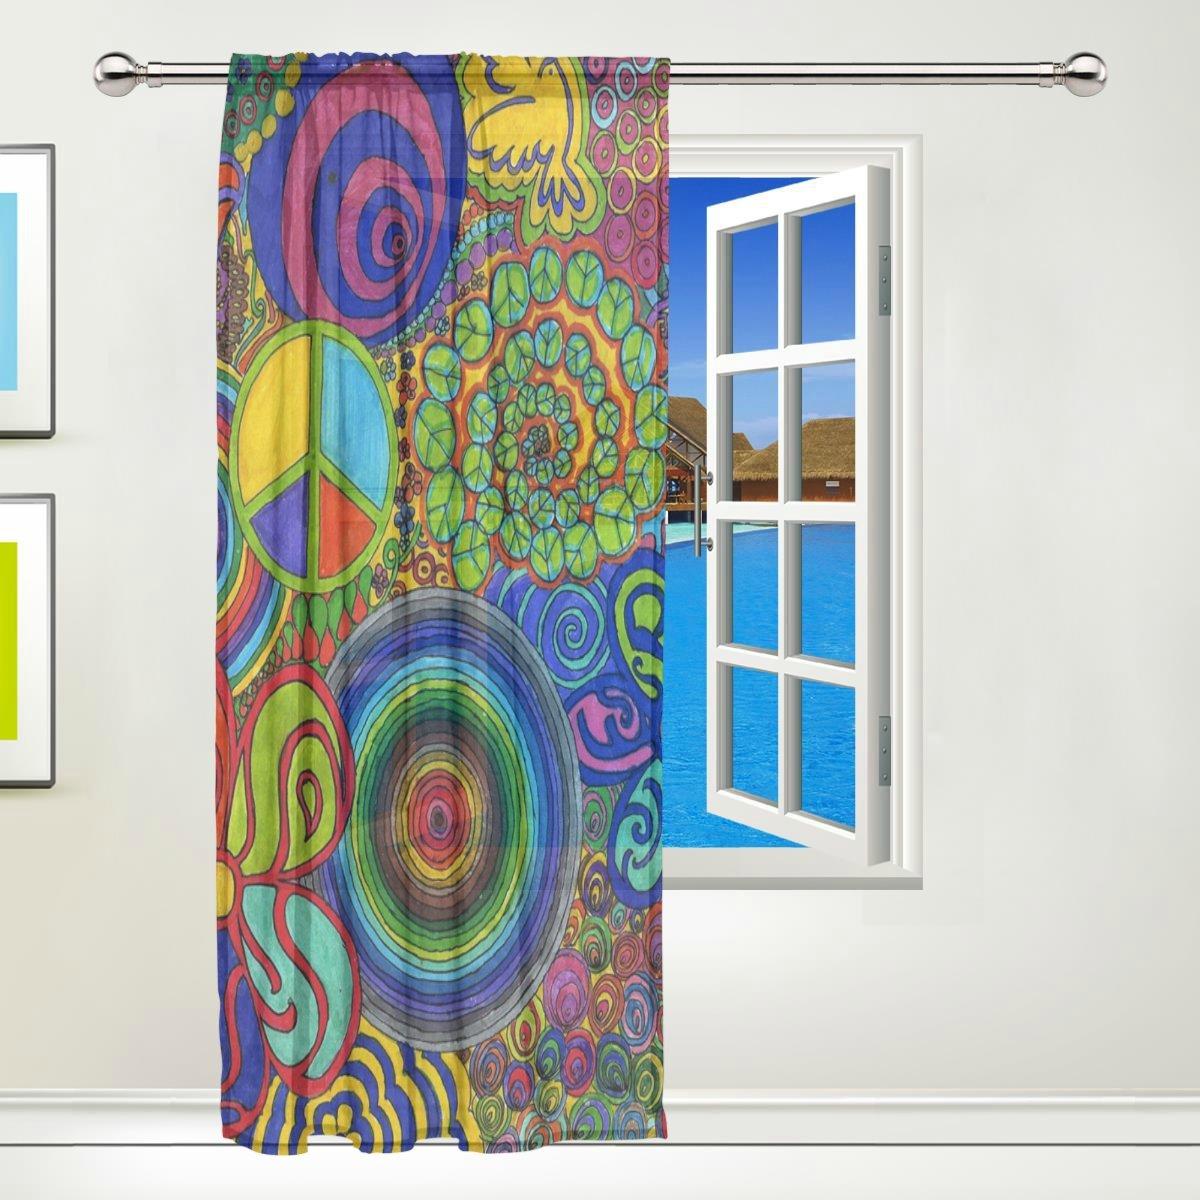 Earth Heart Window Sheer Curtains Digital Printed Polyester Fiber Drapes for Door Kitchen Living Room Bedroom